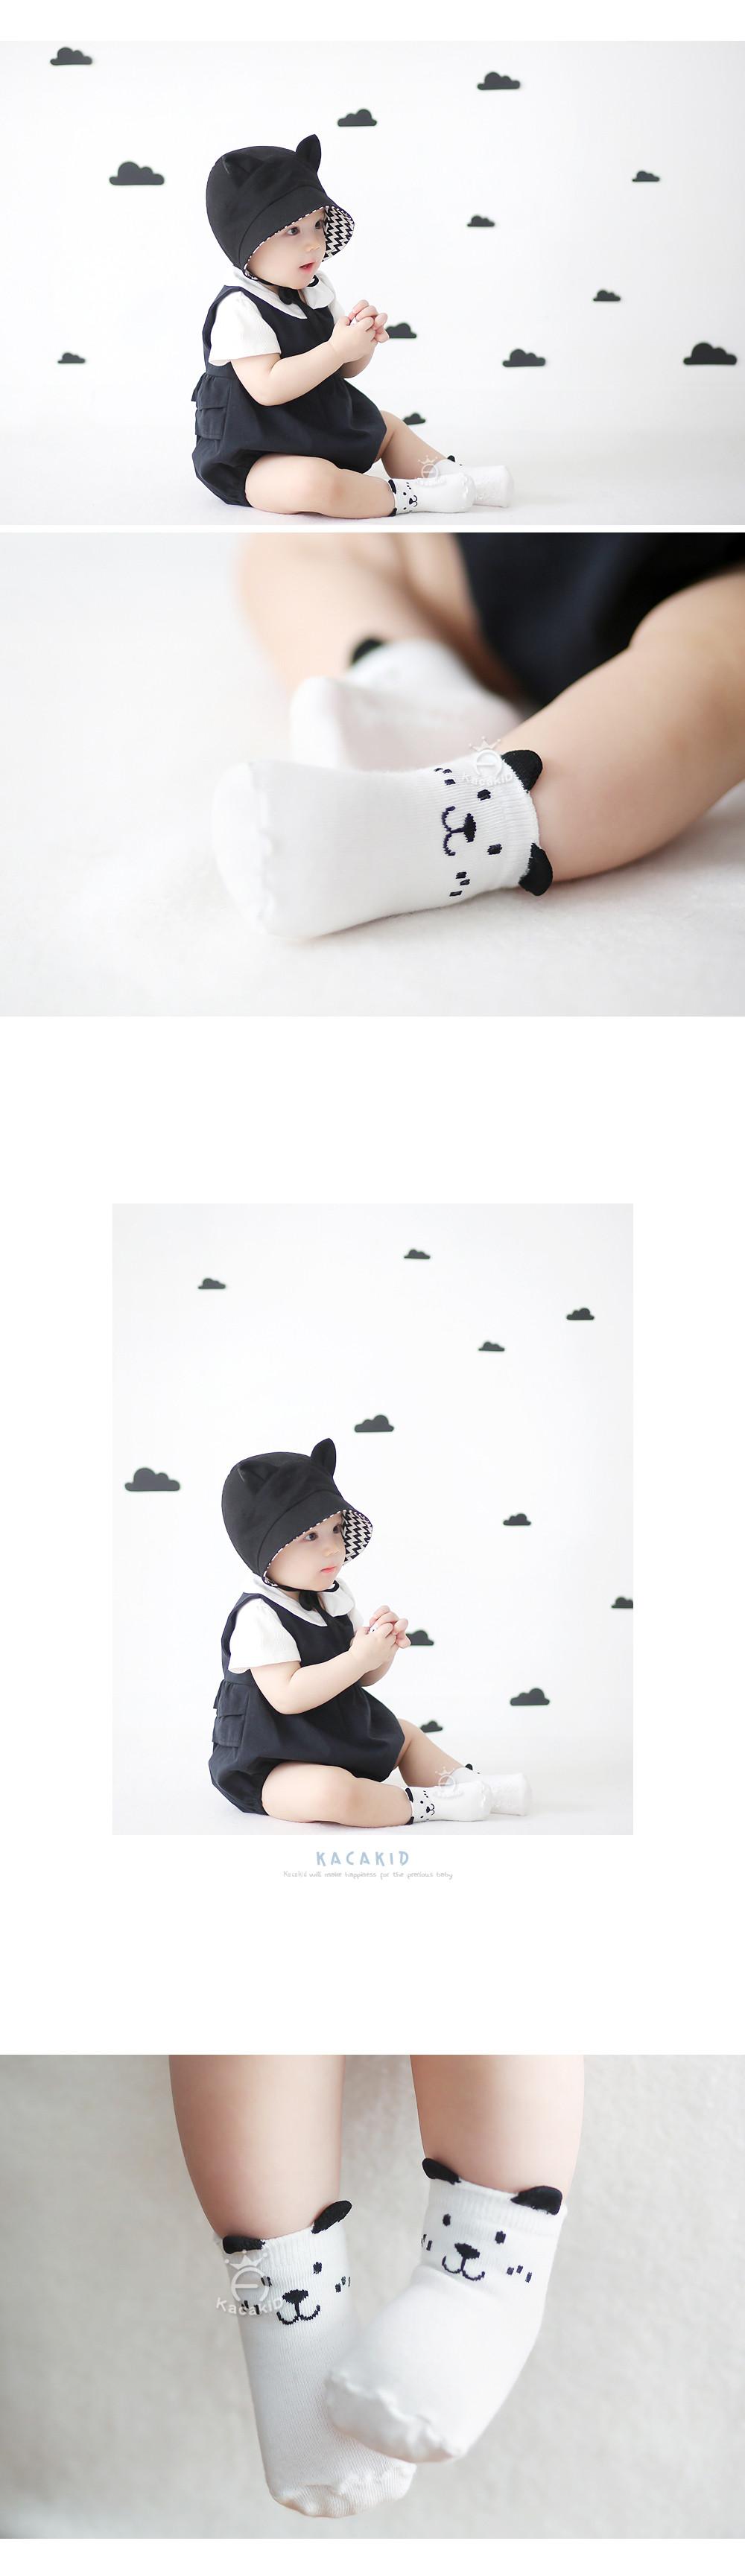 Hot Sales Newborn Cotton Non-Slip Baby Socks 100% Cotton Autum Winter Infant Cartoon Socks With High Quality